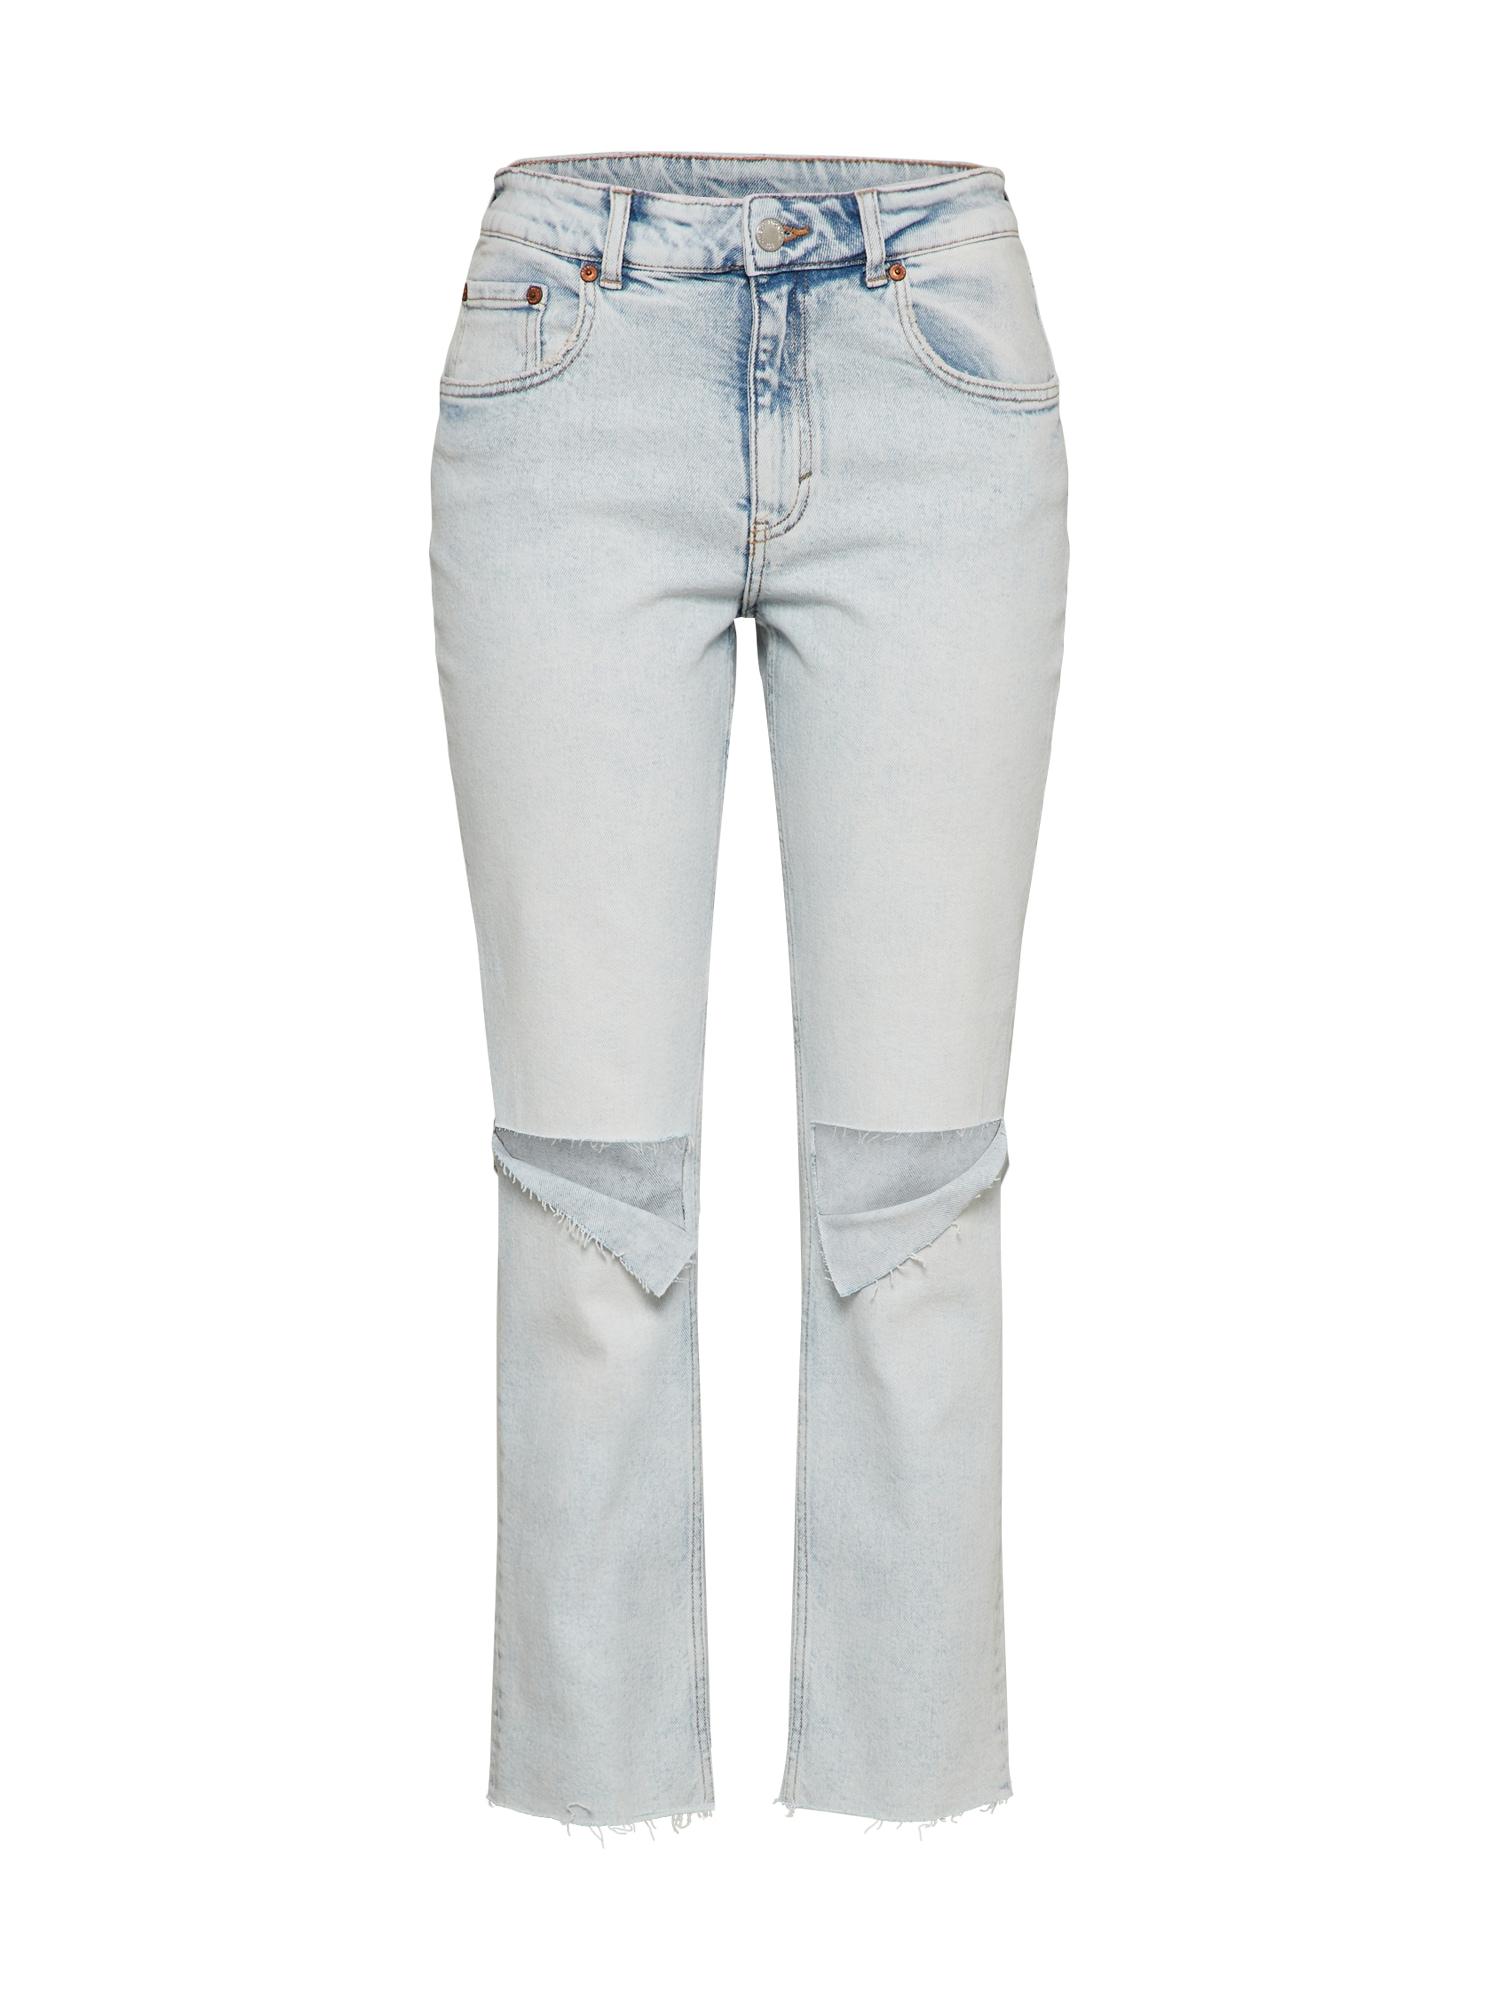 CHEAP MONDAY Dames Jeans Revive lichtblauw